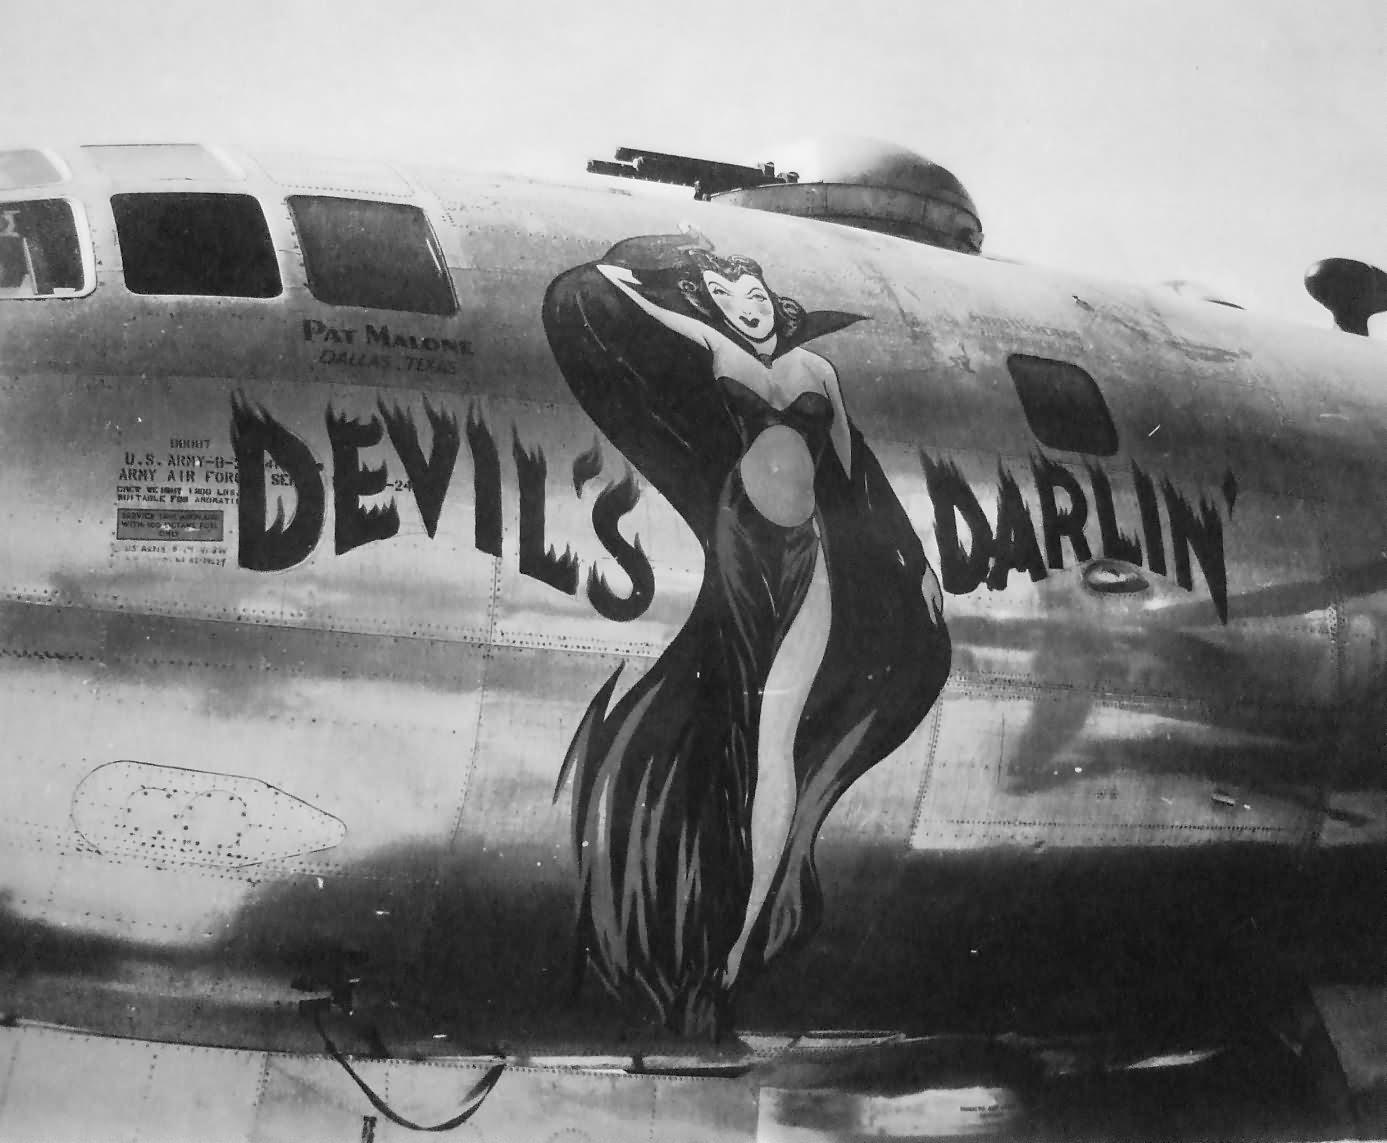 Boeing B-29-40-BW Superfortress DEVIL S DARLIN nose art Tinian 1945